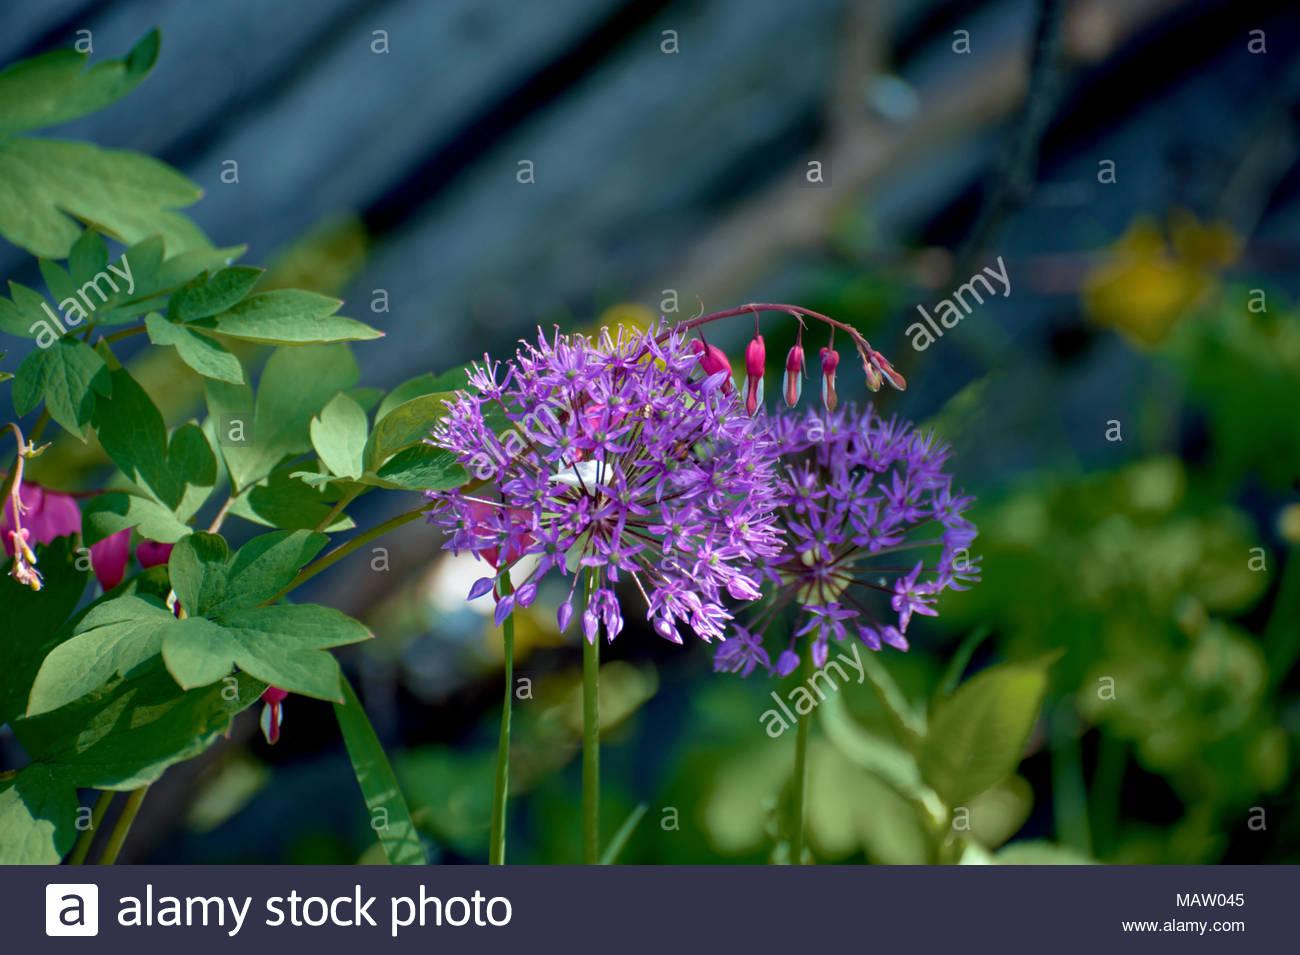 Romantic midsummer. Heartshaped pink flowers called Bleeding heart or Asian bleeding-heart. The lilac, purple flower is an Allium Violet Beauty. - Stock Image